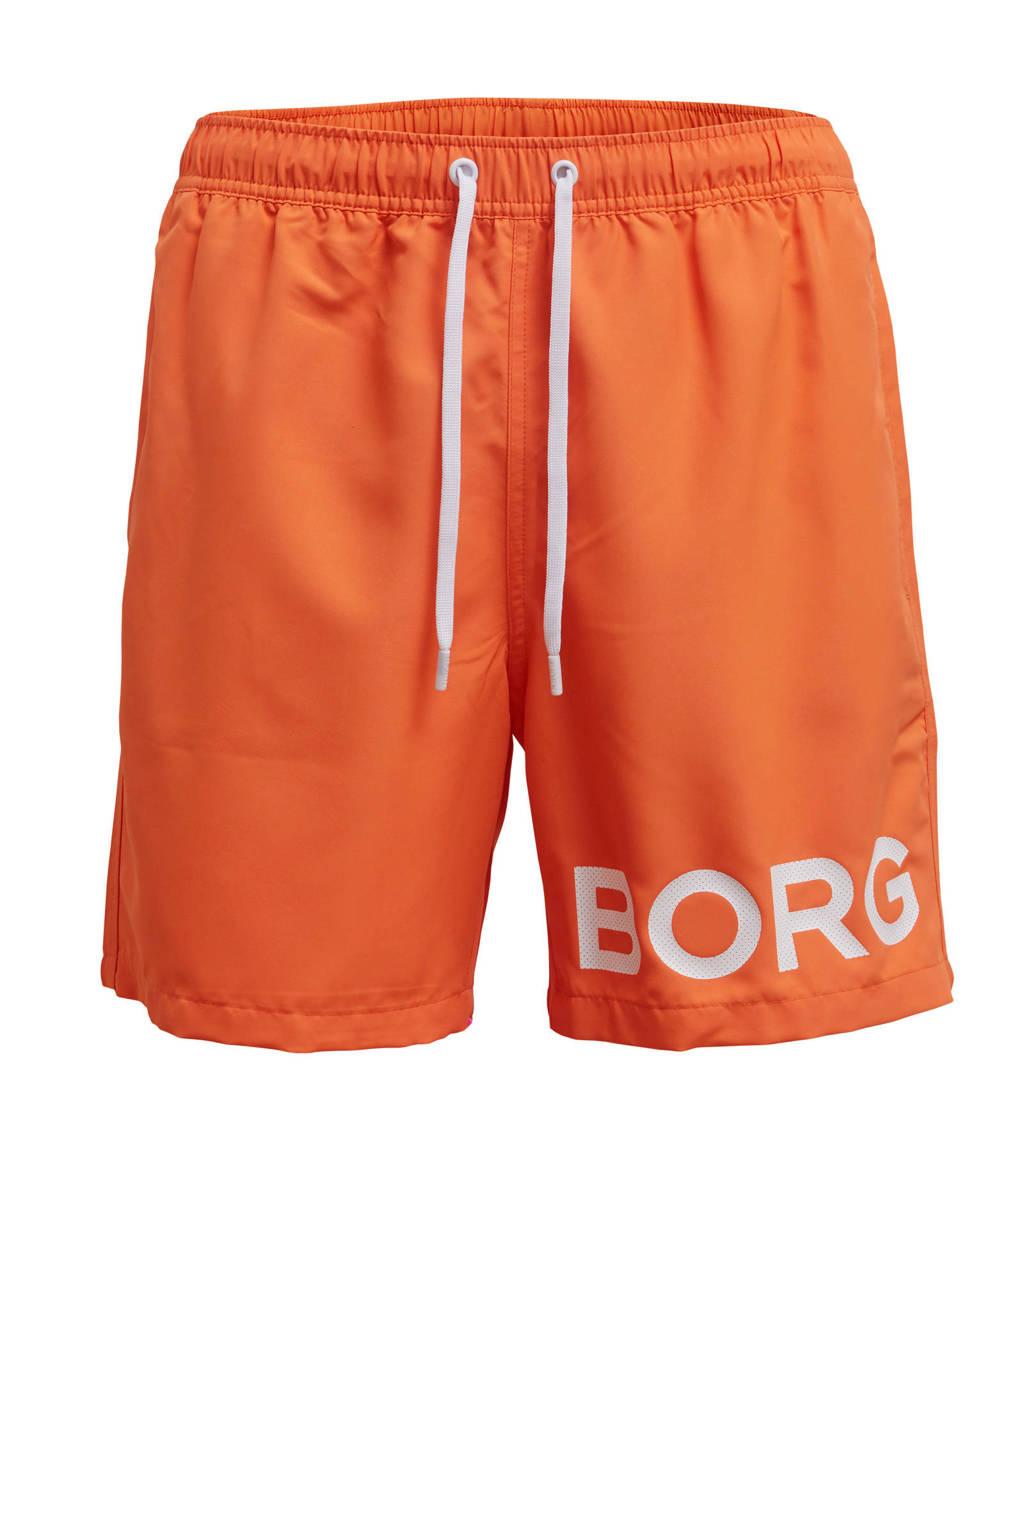 Björn Borg zwemshort Sheldon oranje, Oranje